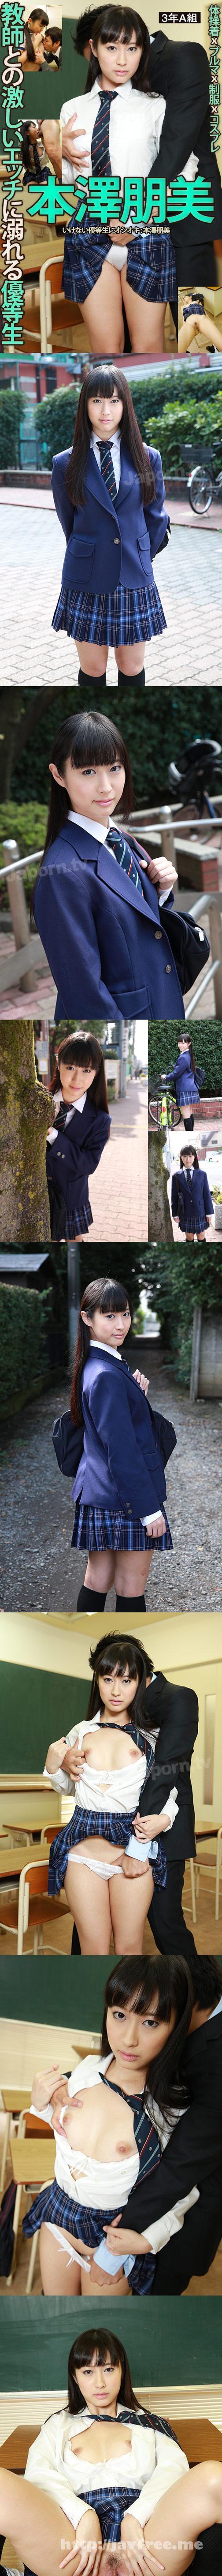 [DSAM 80] いけない優等生にオシオキ : 本澤朋美 本澤朋美 Tomomi Motozawa DSAM